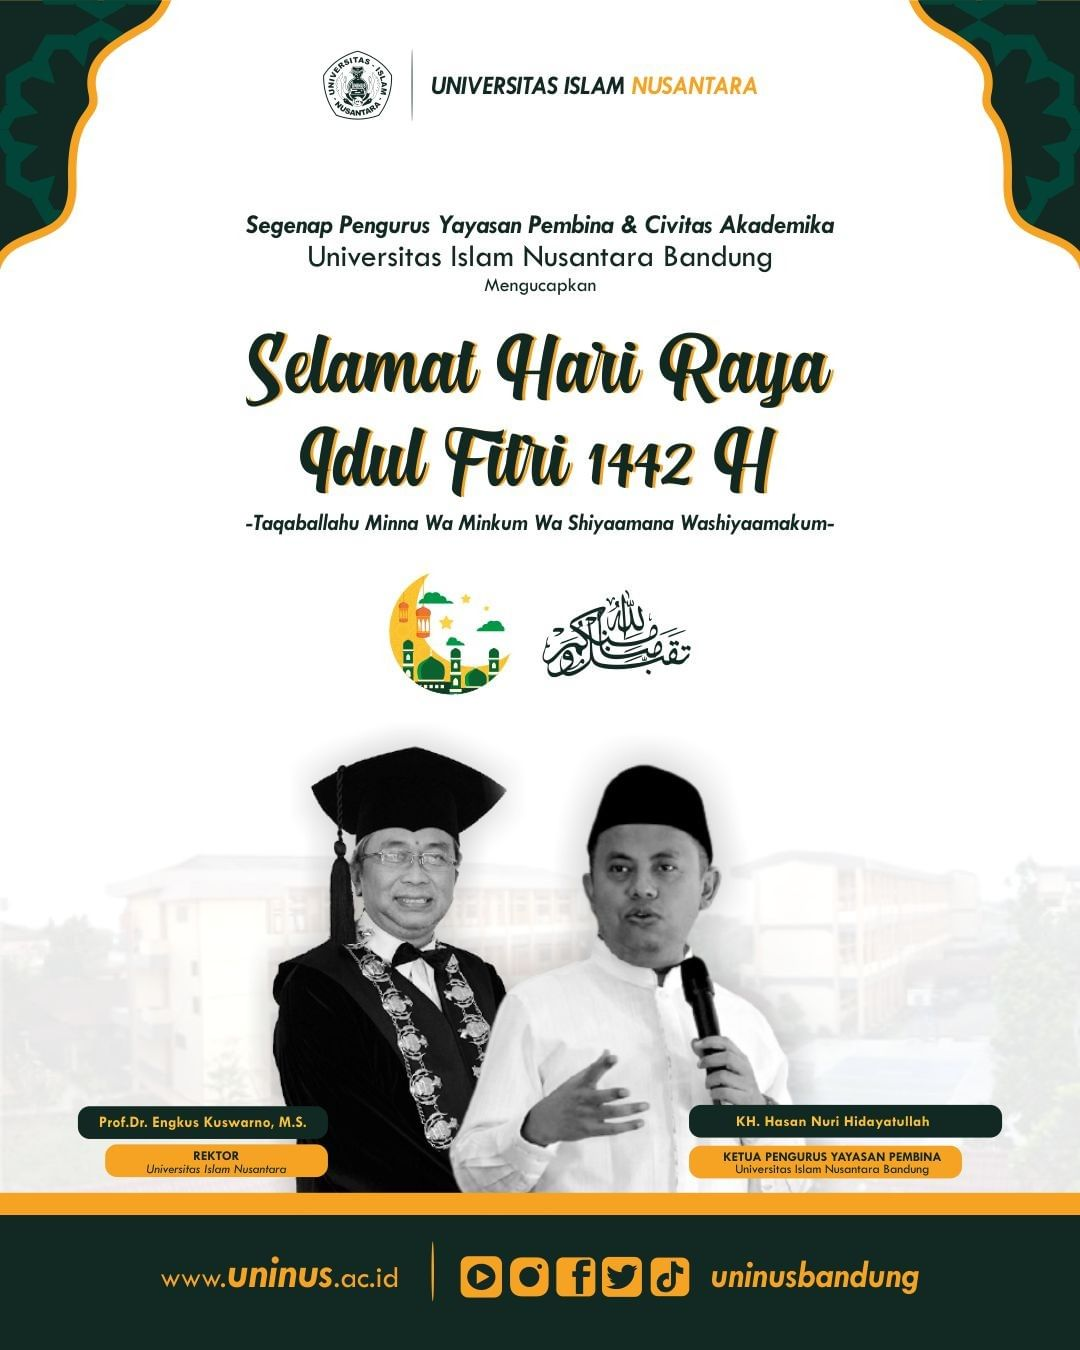 Segenap Pengurus Yayasan Pembina & Civitas Akademika Universitas Islam Nusantara…